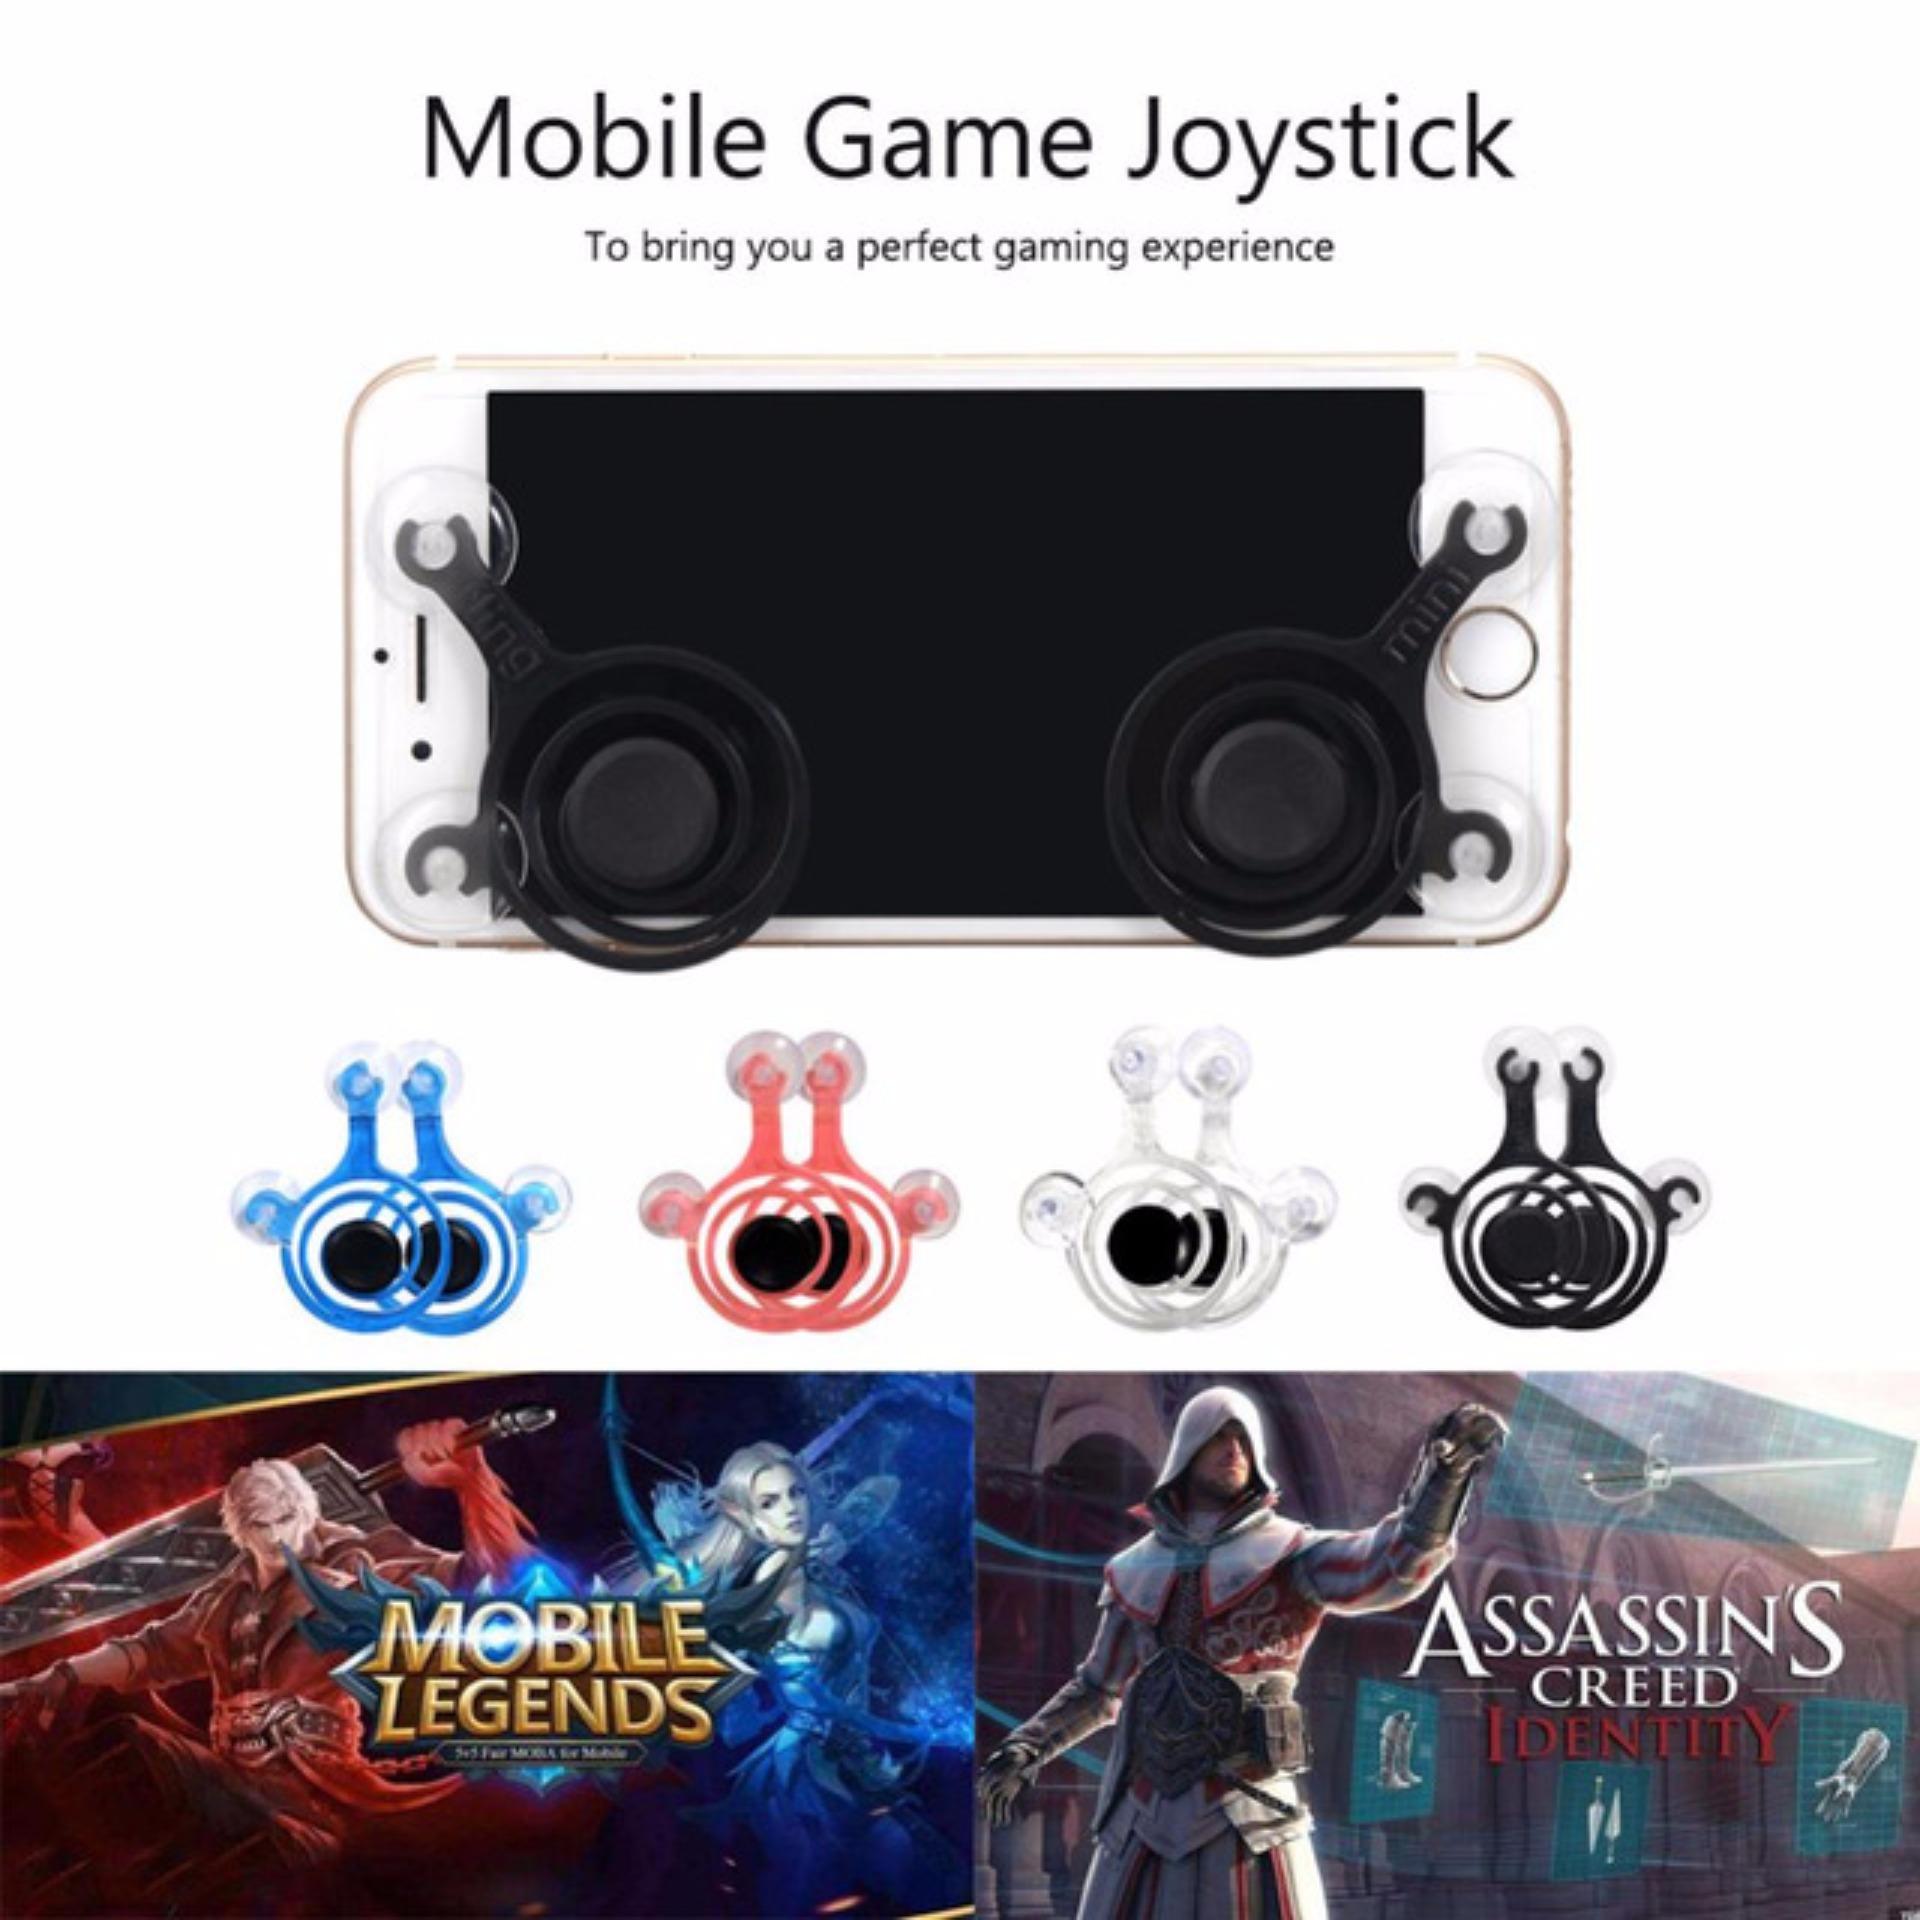 ... Fling Mini Joystick Gaming Mobile Legend   Mobile Joystick - Clear (2pcs) ...